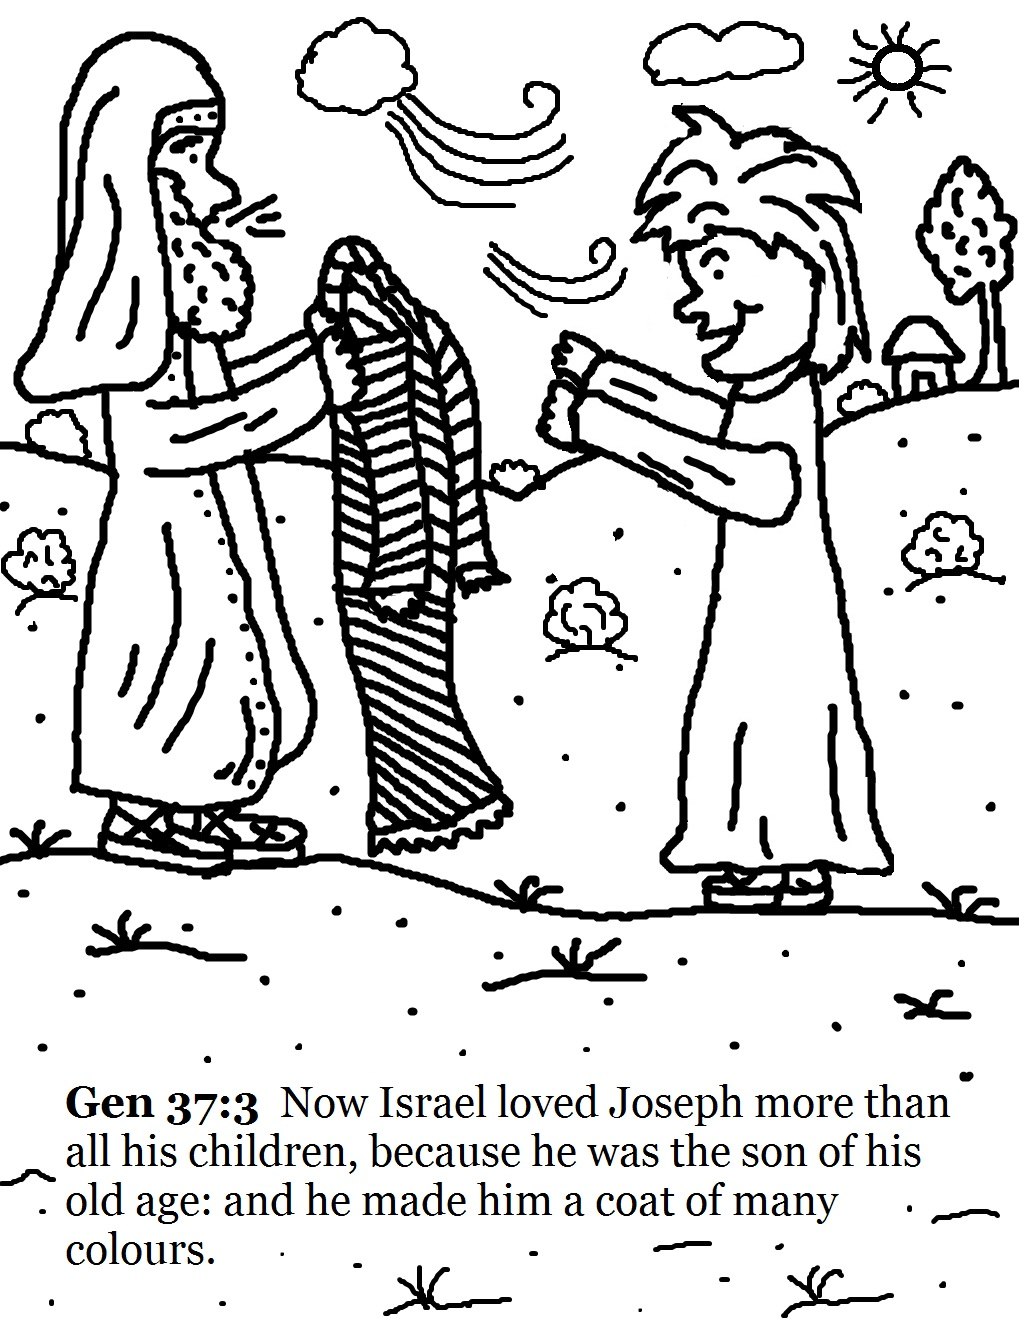 Israel giving joseph a coat